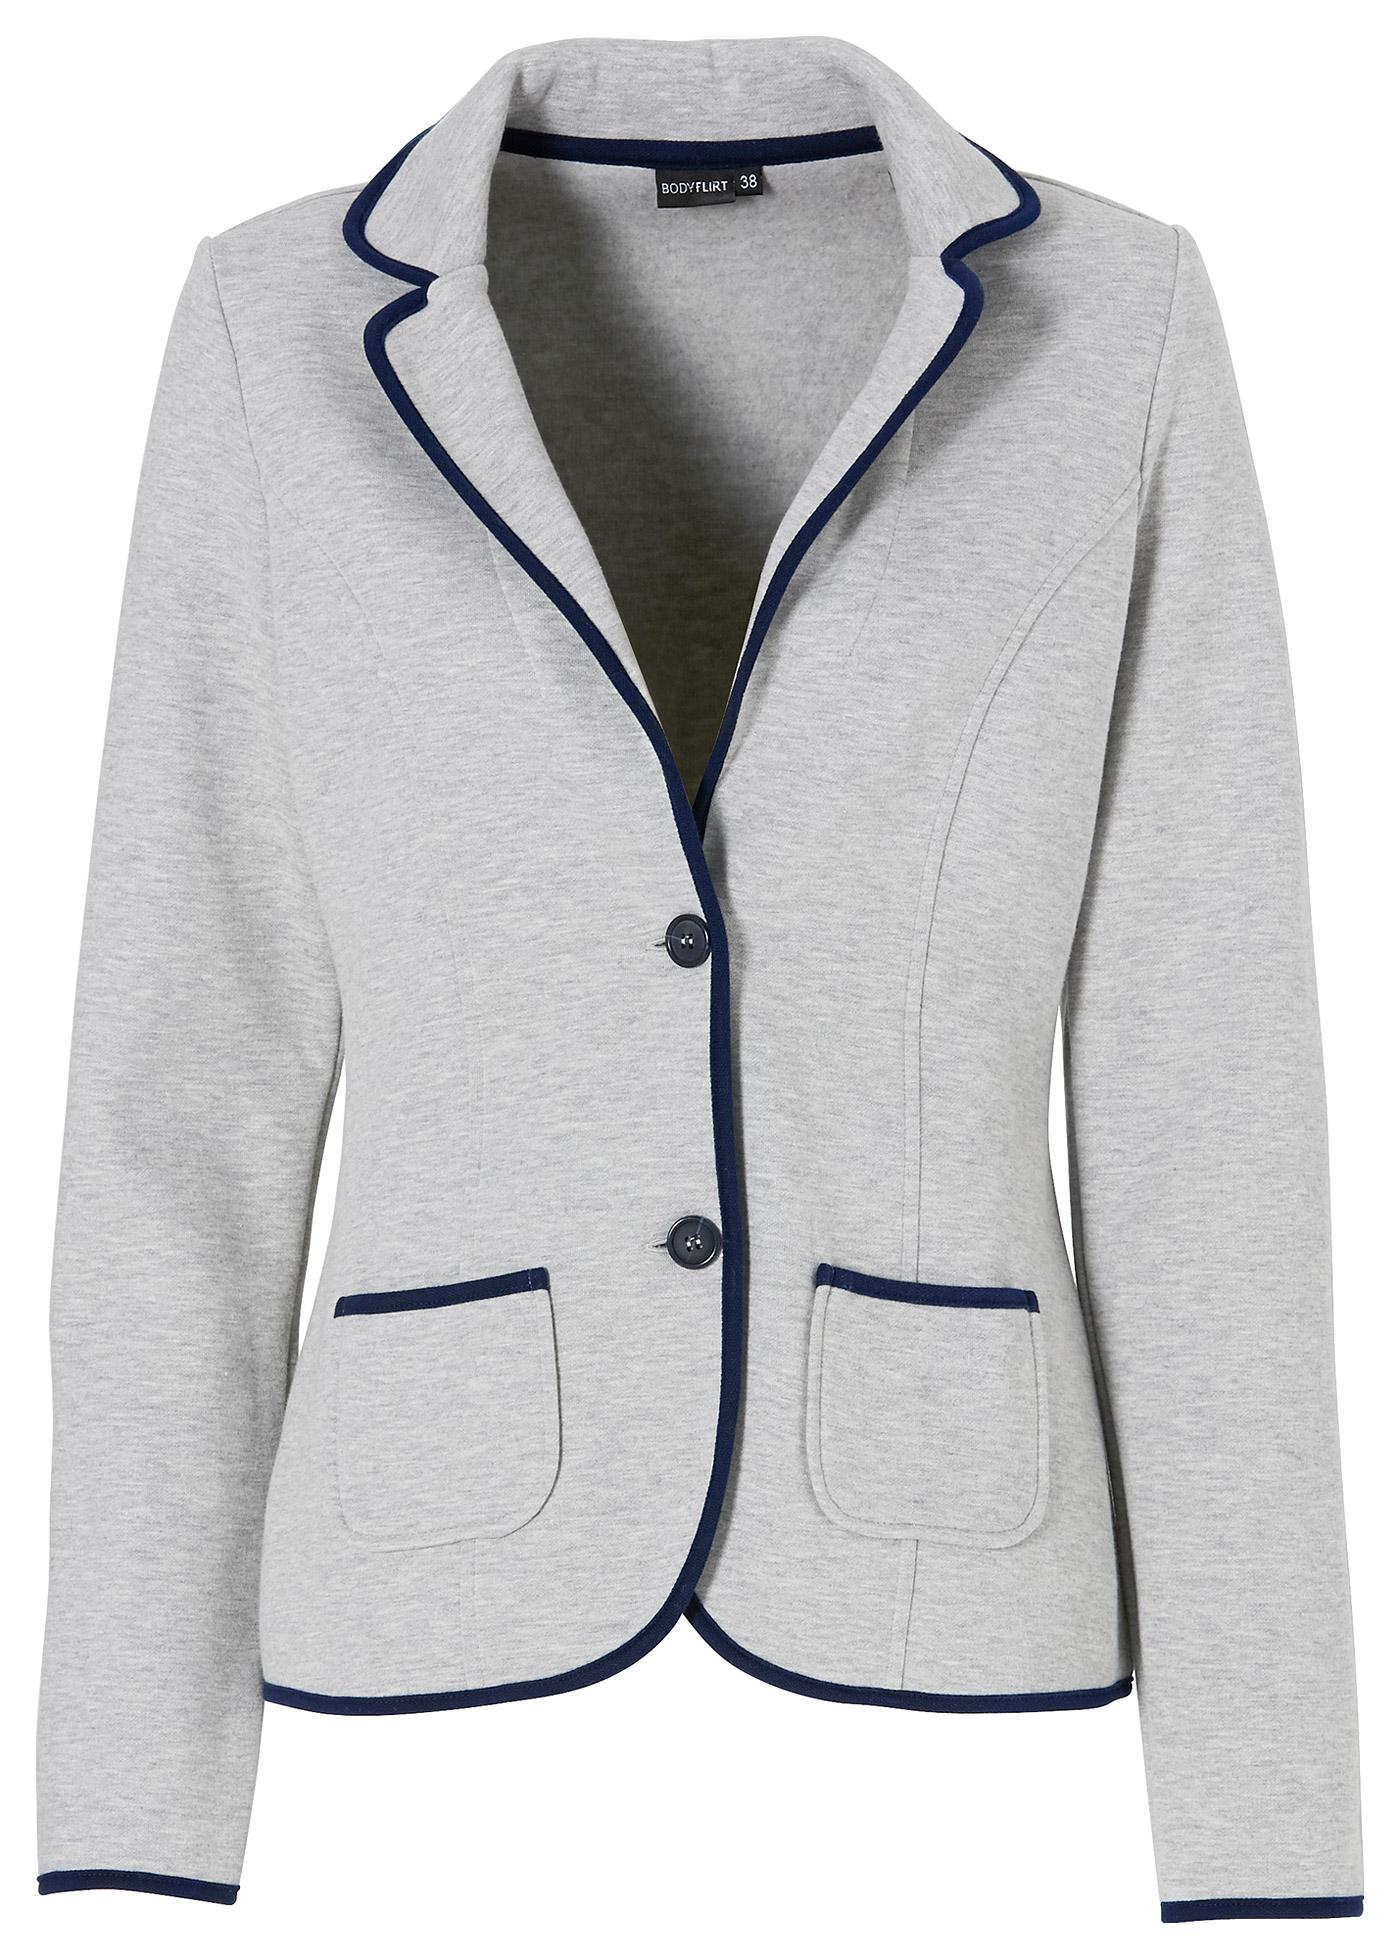 blazer gris femme jusqu 87 pureshopping. Black Bedroom Furniture Sets. Home Design Ideas